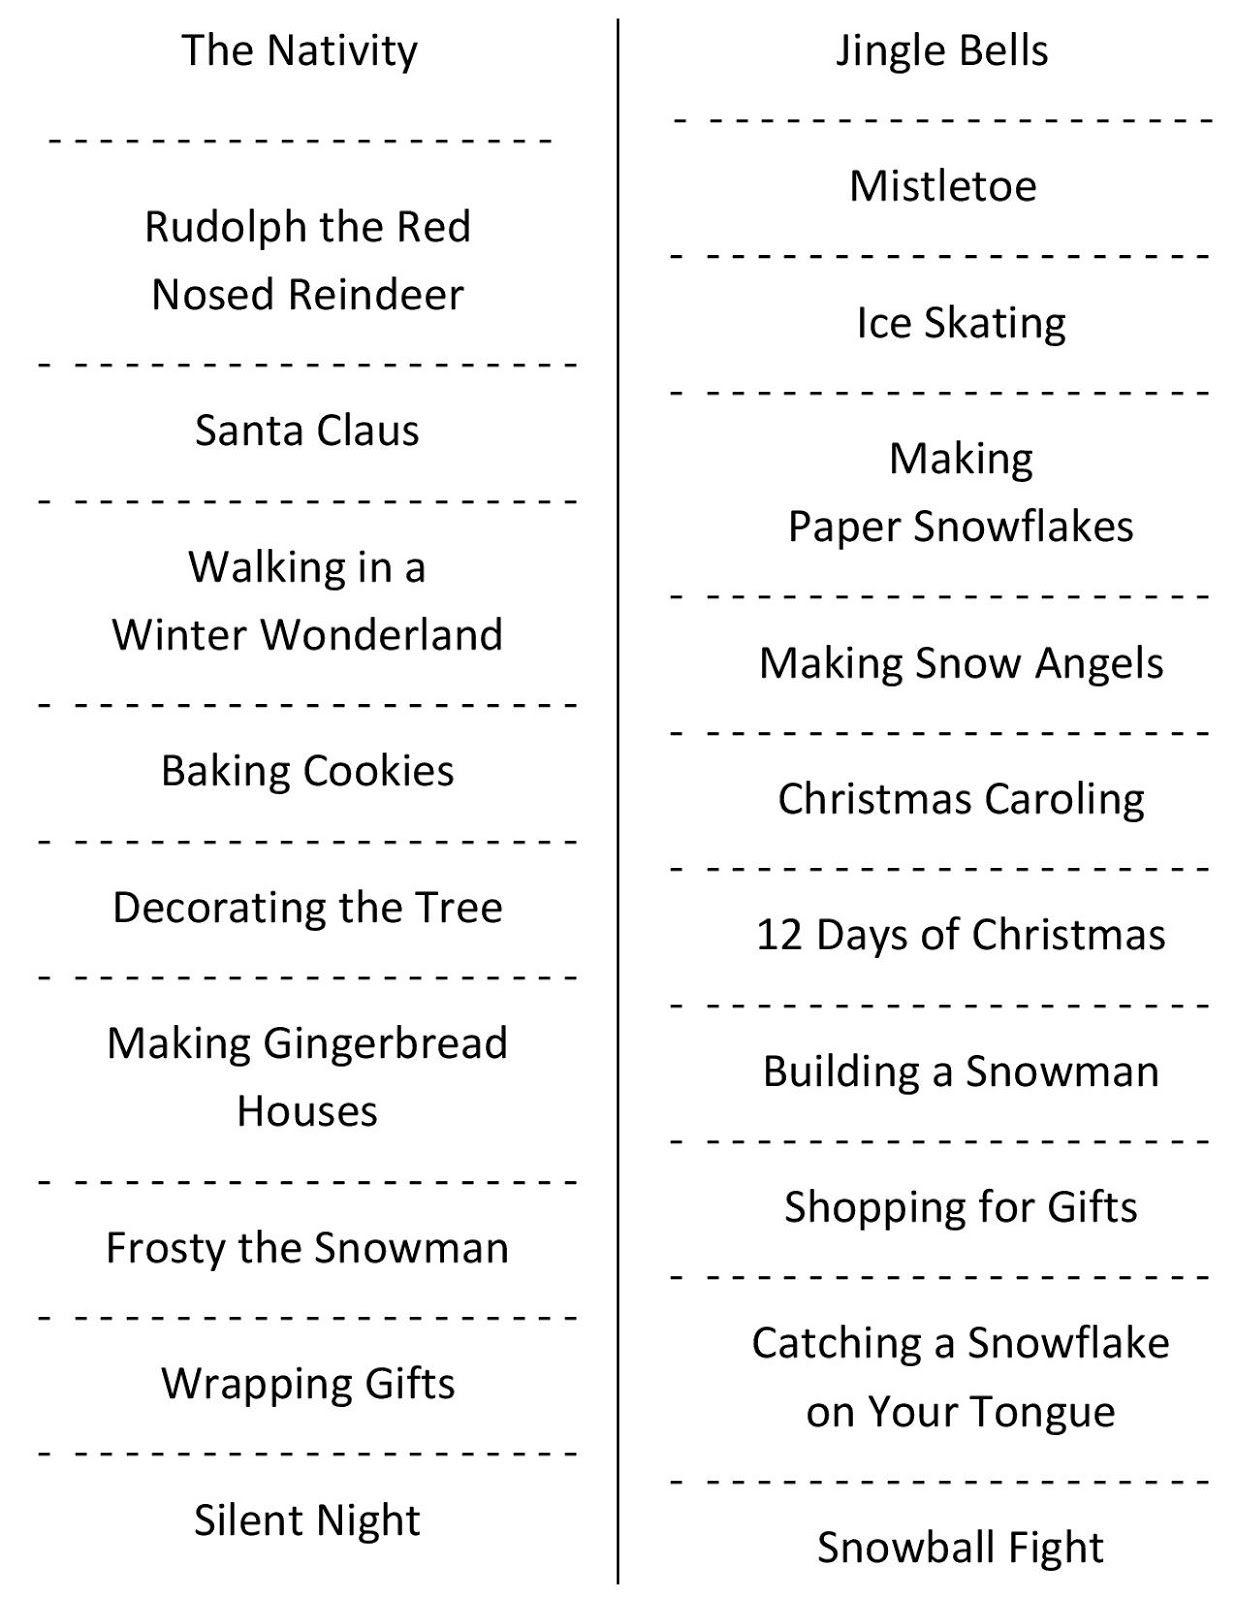 Christmas Charades (Free Printable Party Game) | Christmas | Holiday - Free Printable Charades Cards